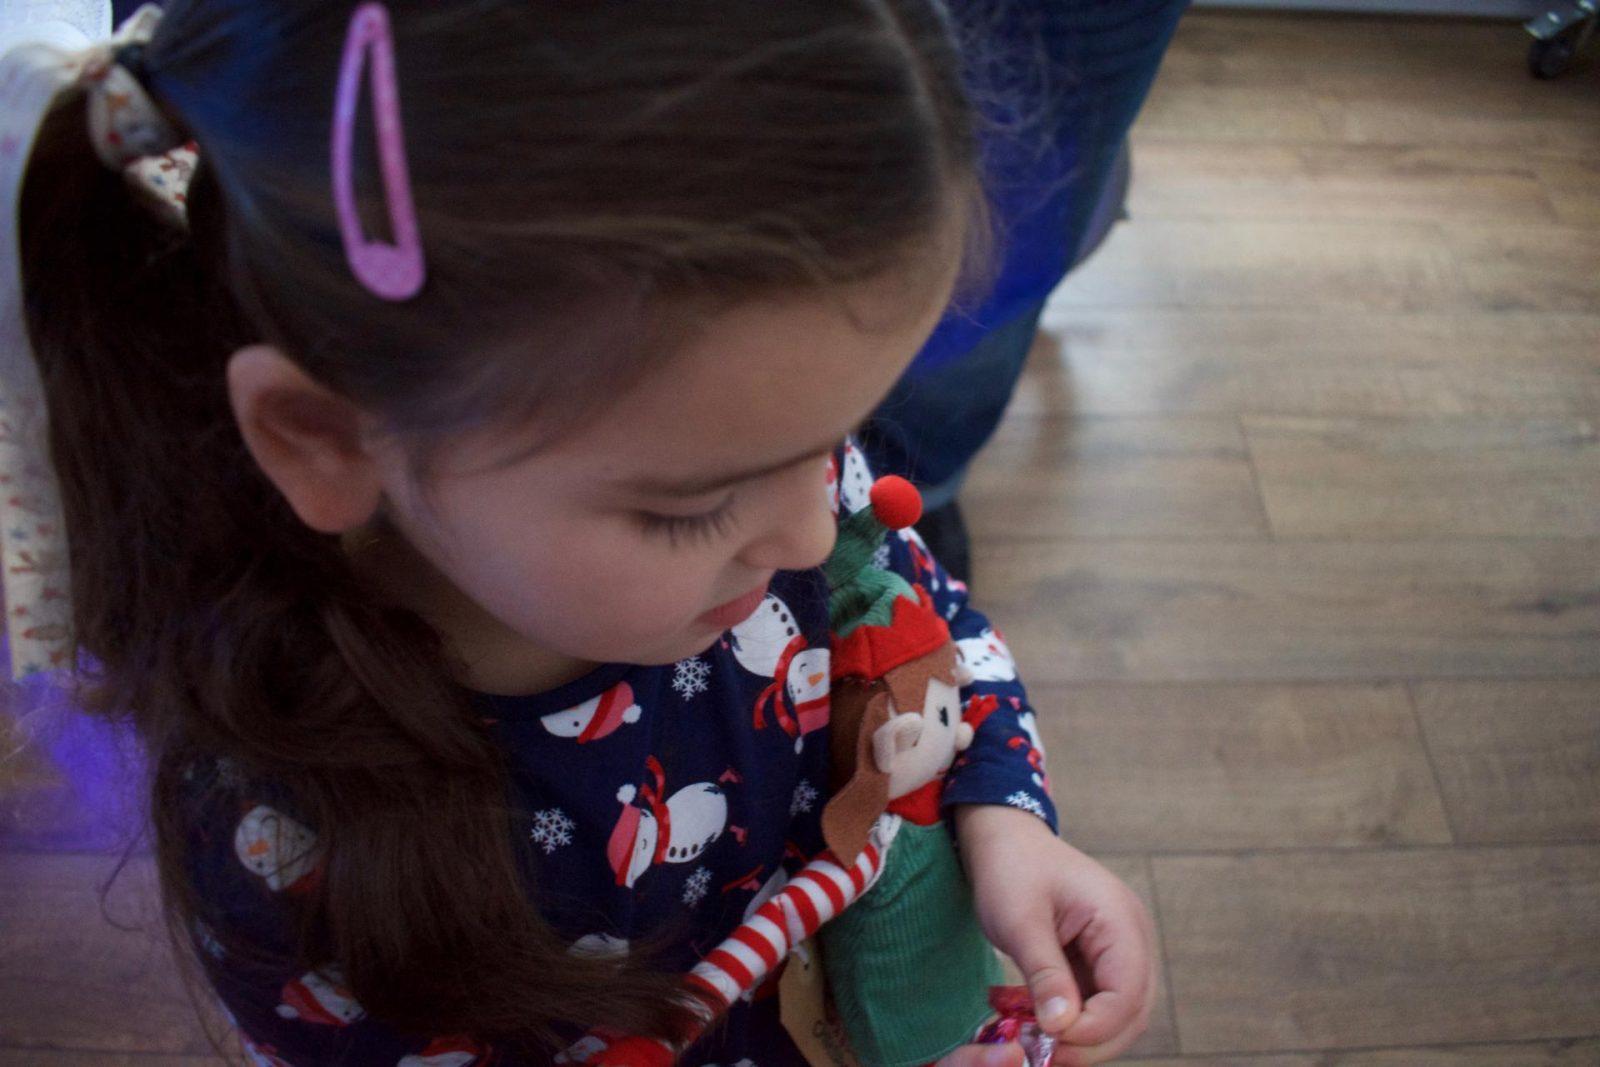 Elf On A Shelf - So Good, It Was An Epic Fail